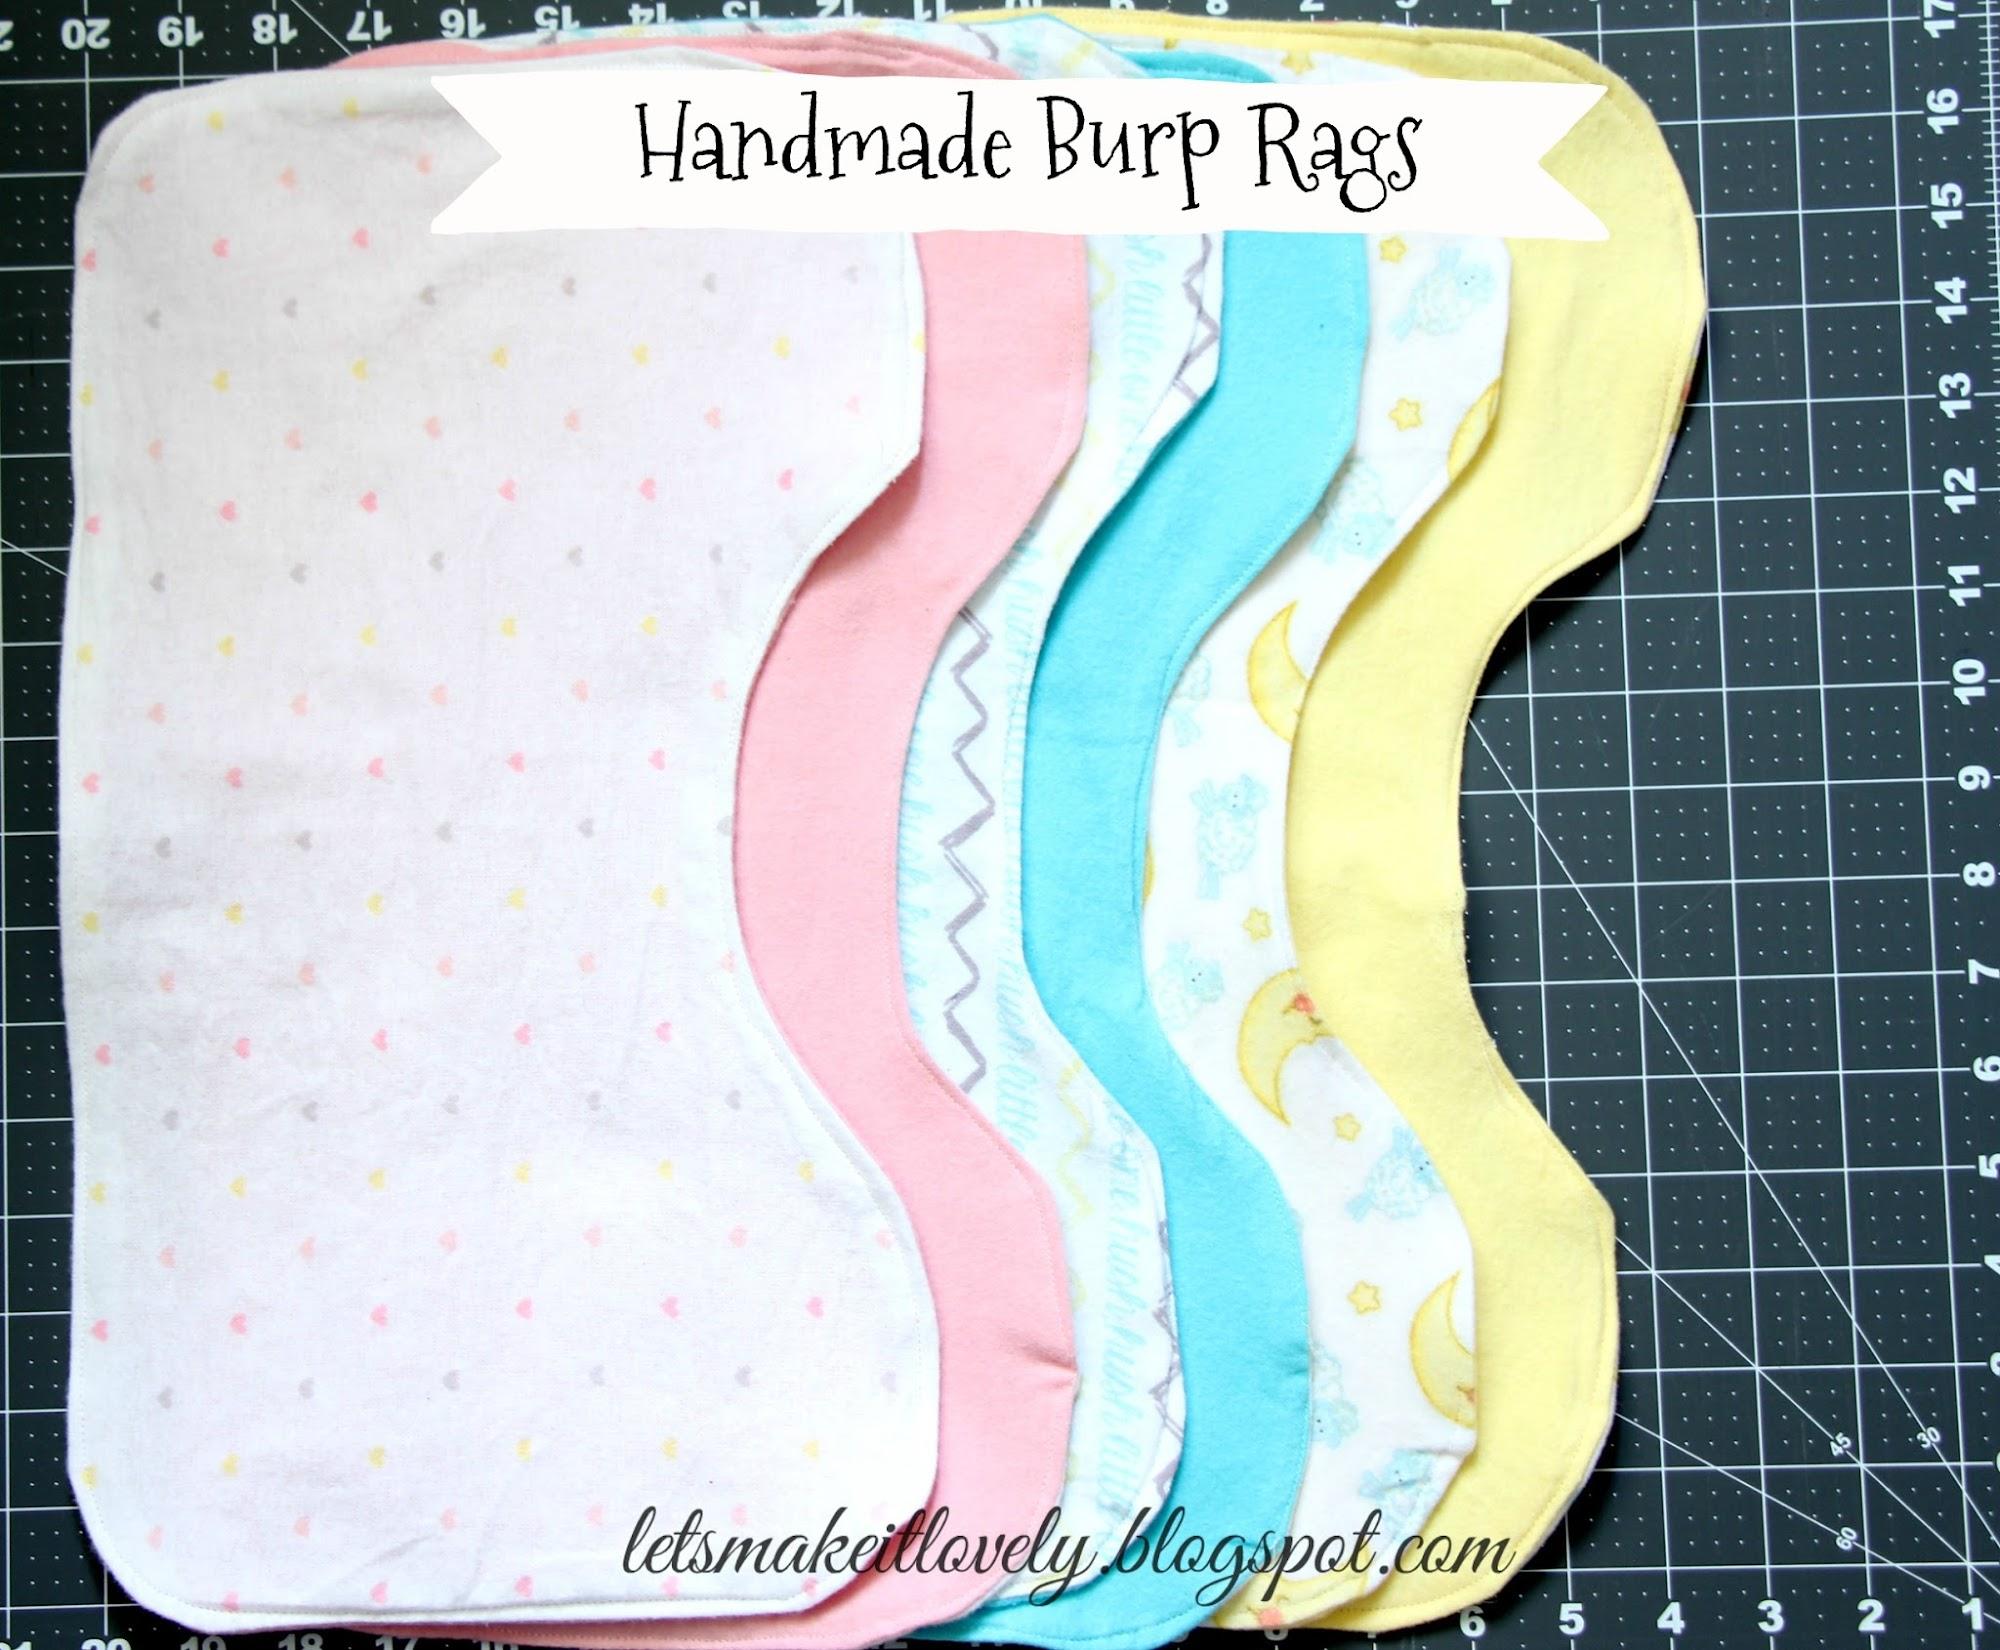 Handmade Burp Rags. Soft Burp rags. Sew Burp Rags.